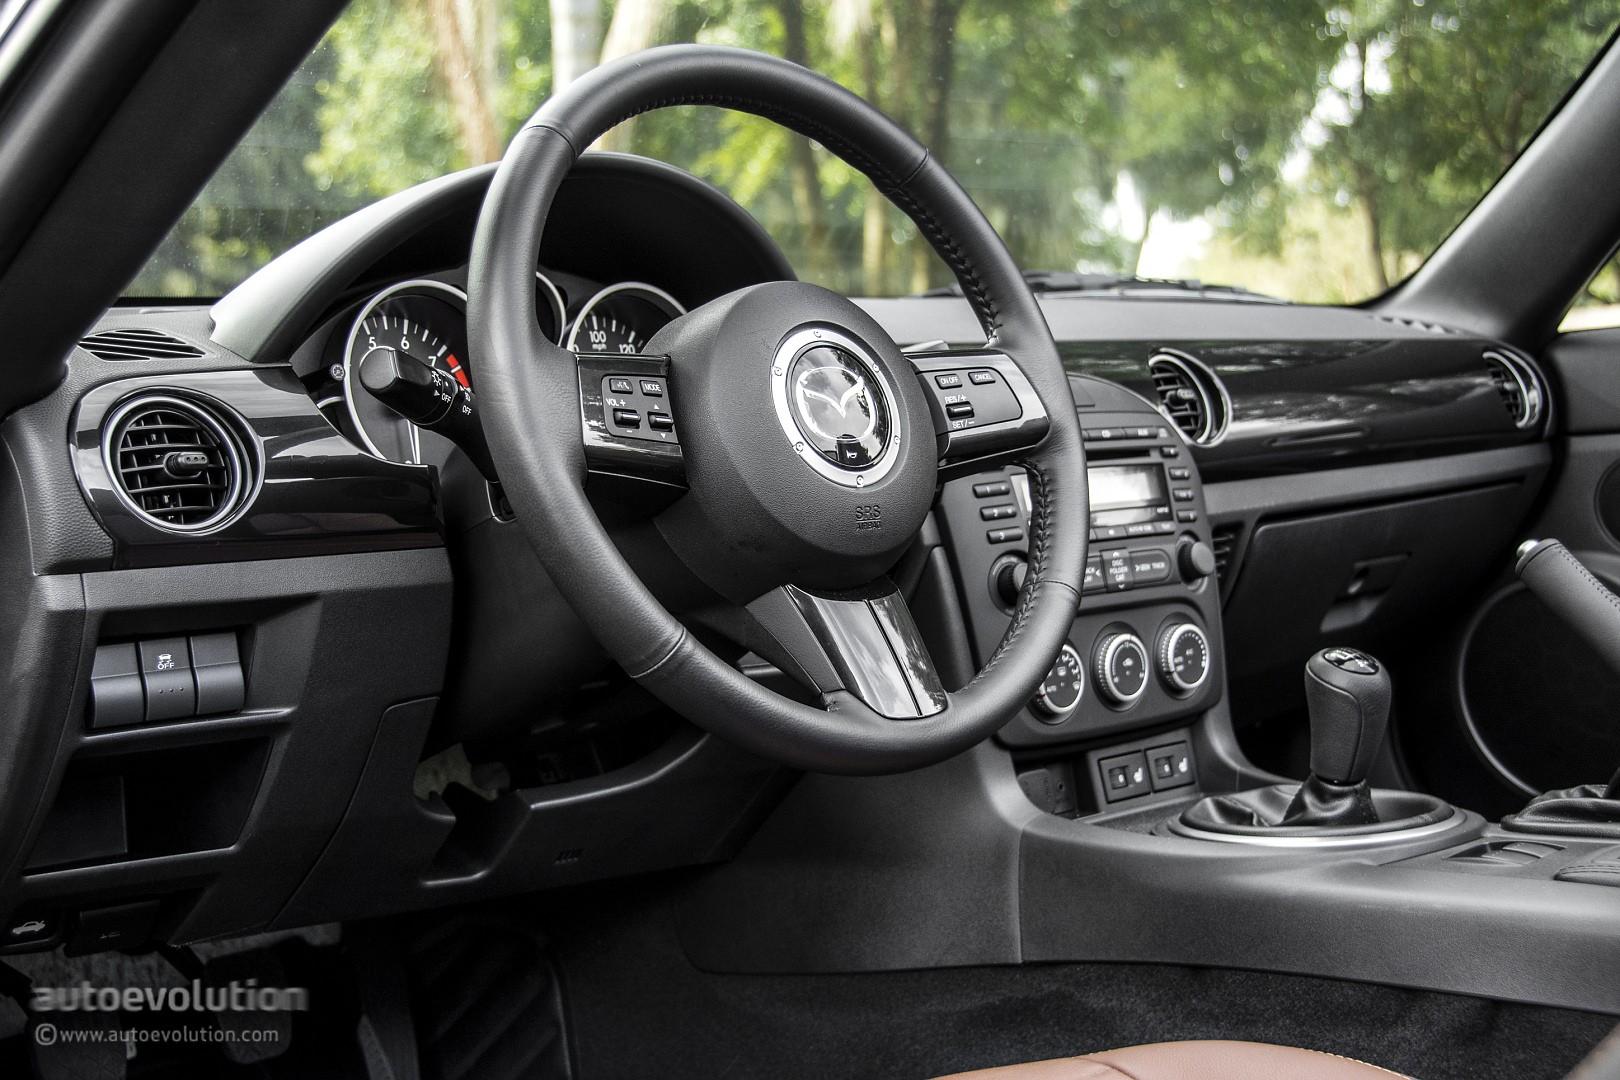 Mx 5 Miata News Test Drive Review Horsepower 2016 Car Release Date #838645